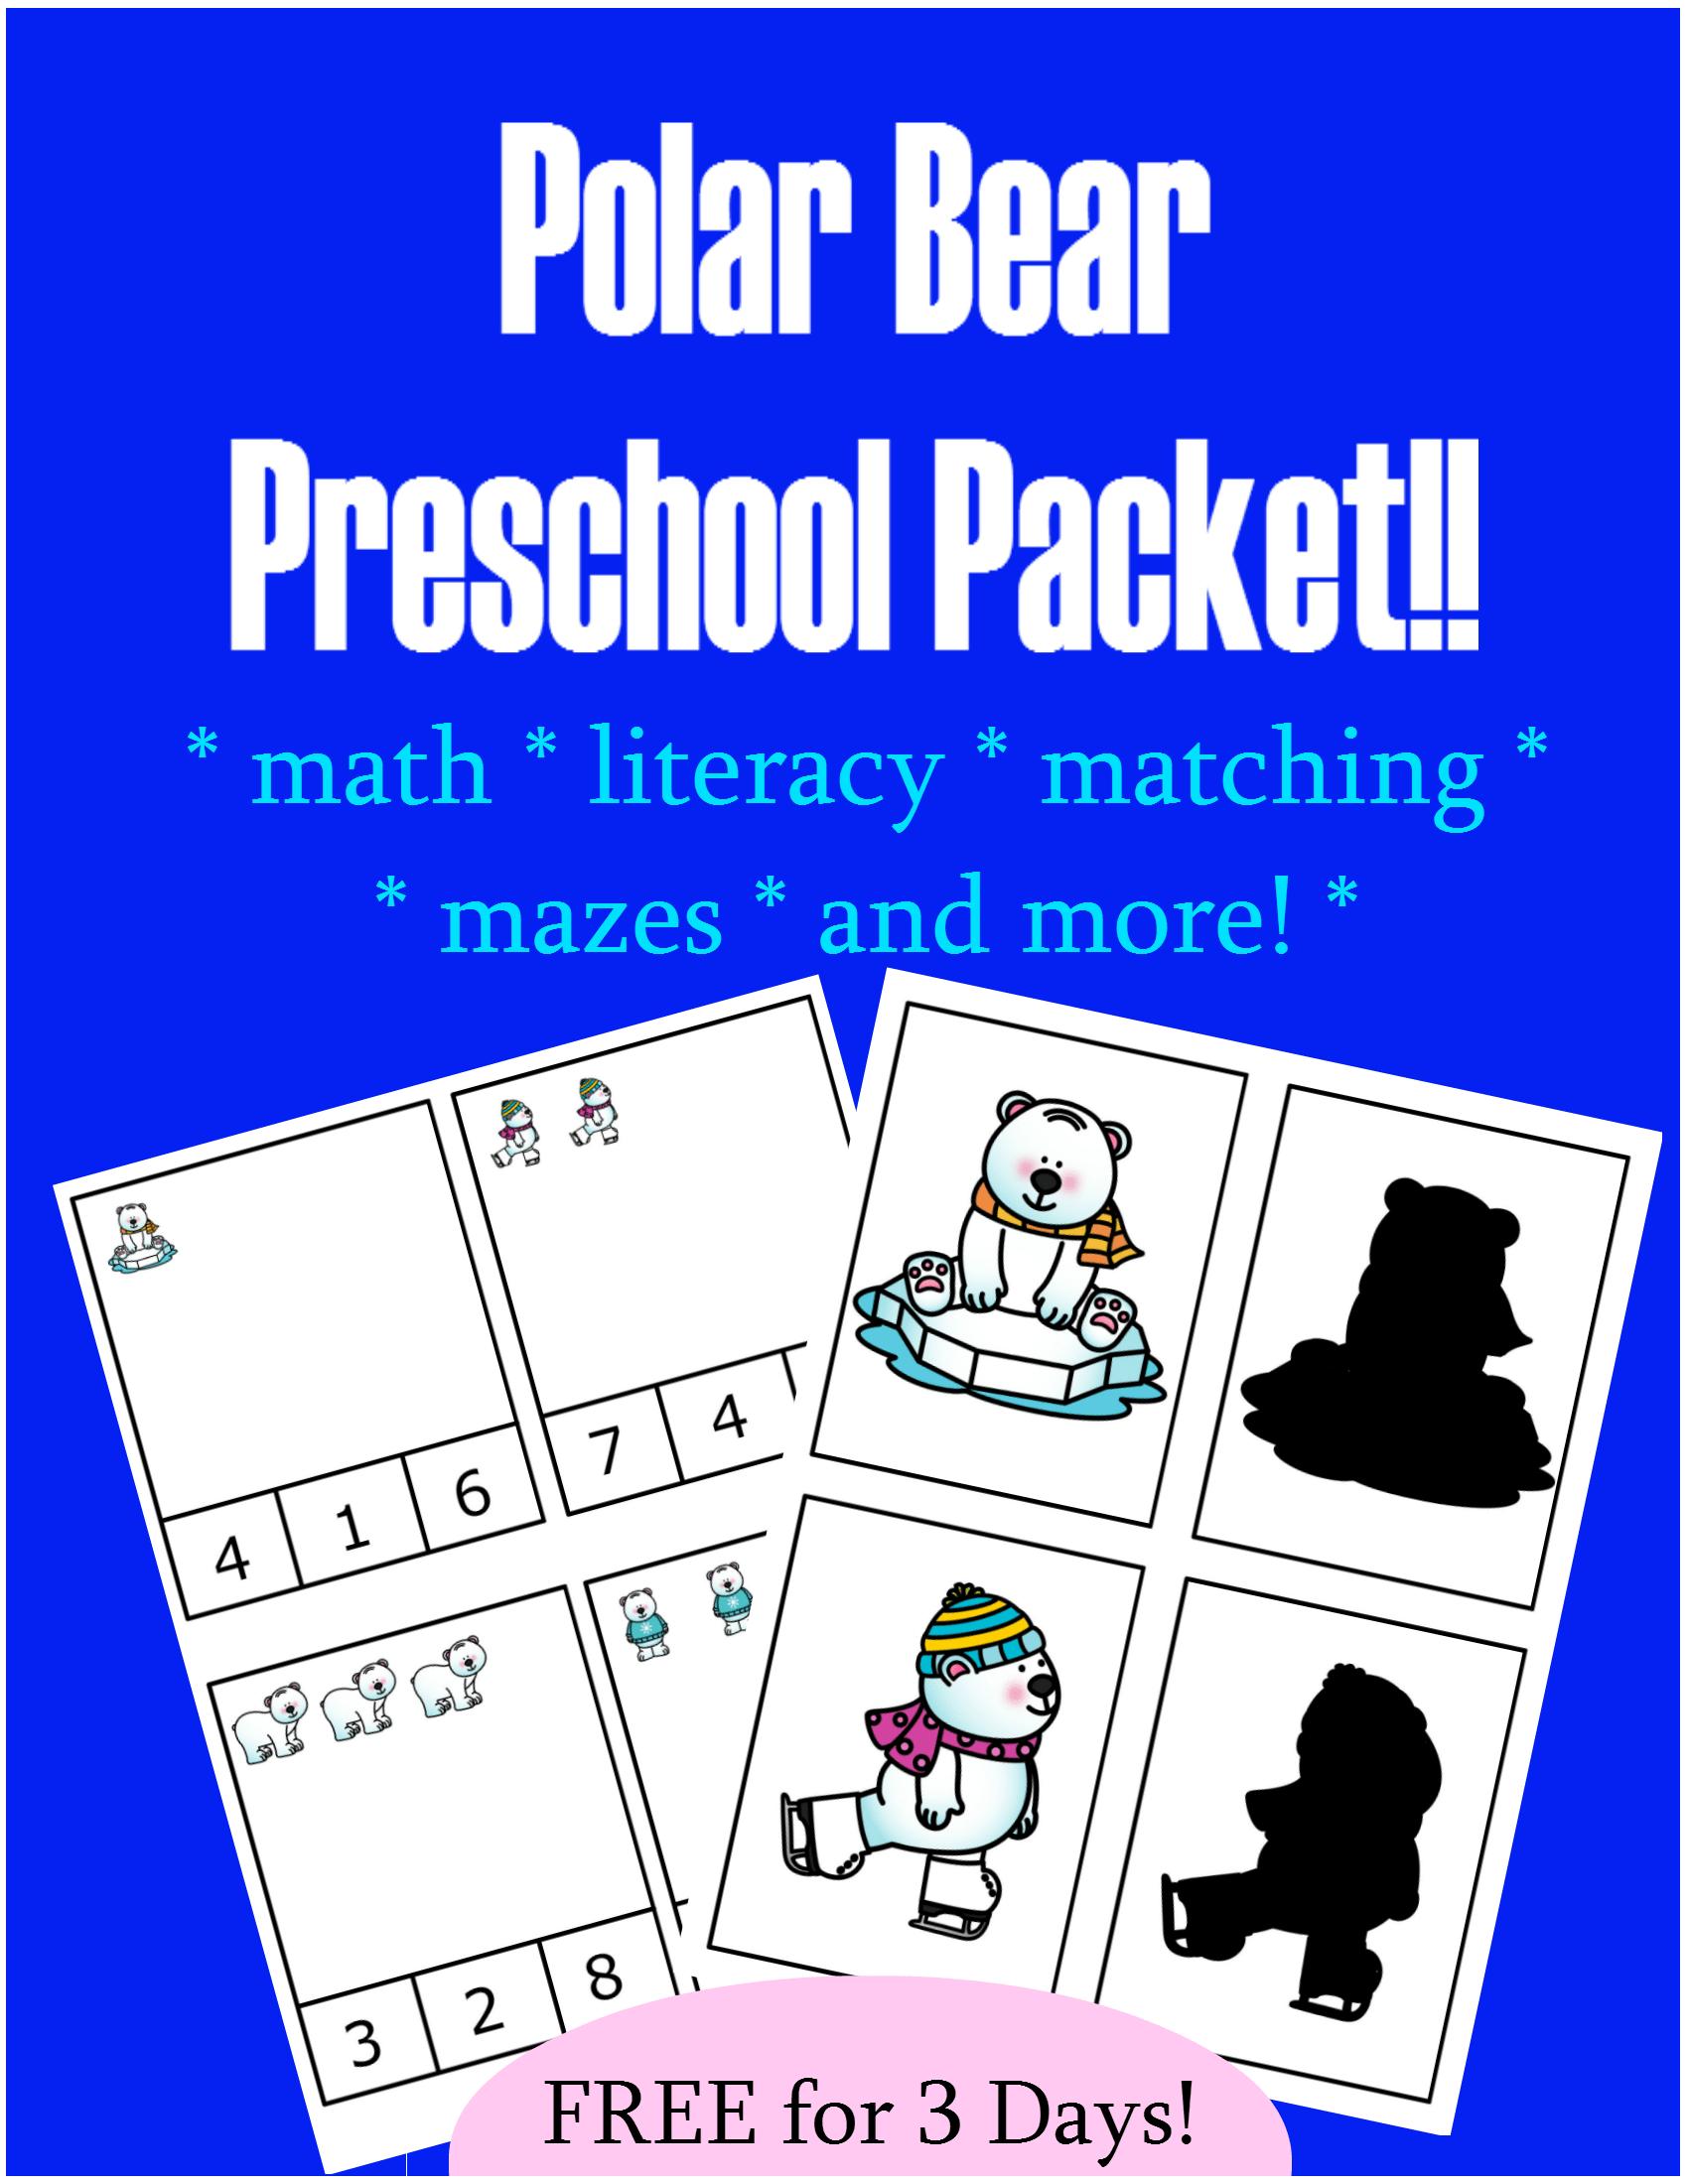 Free Polar Bear Preschool Packet